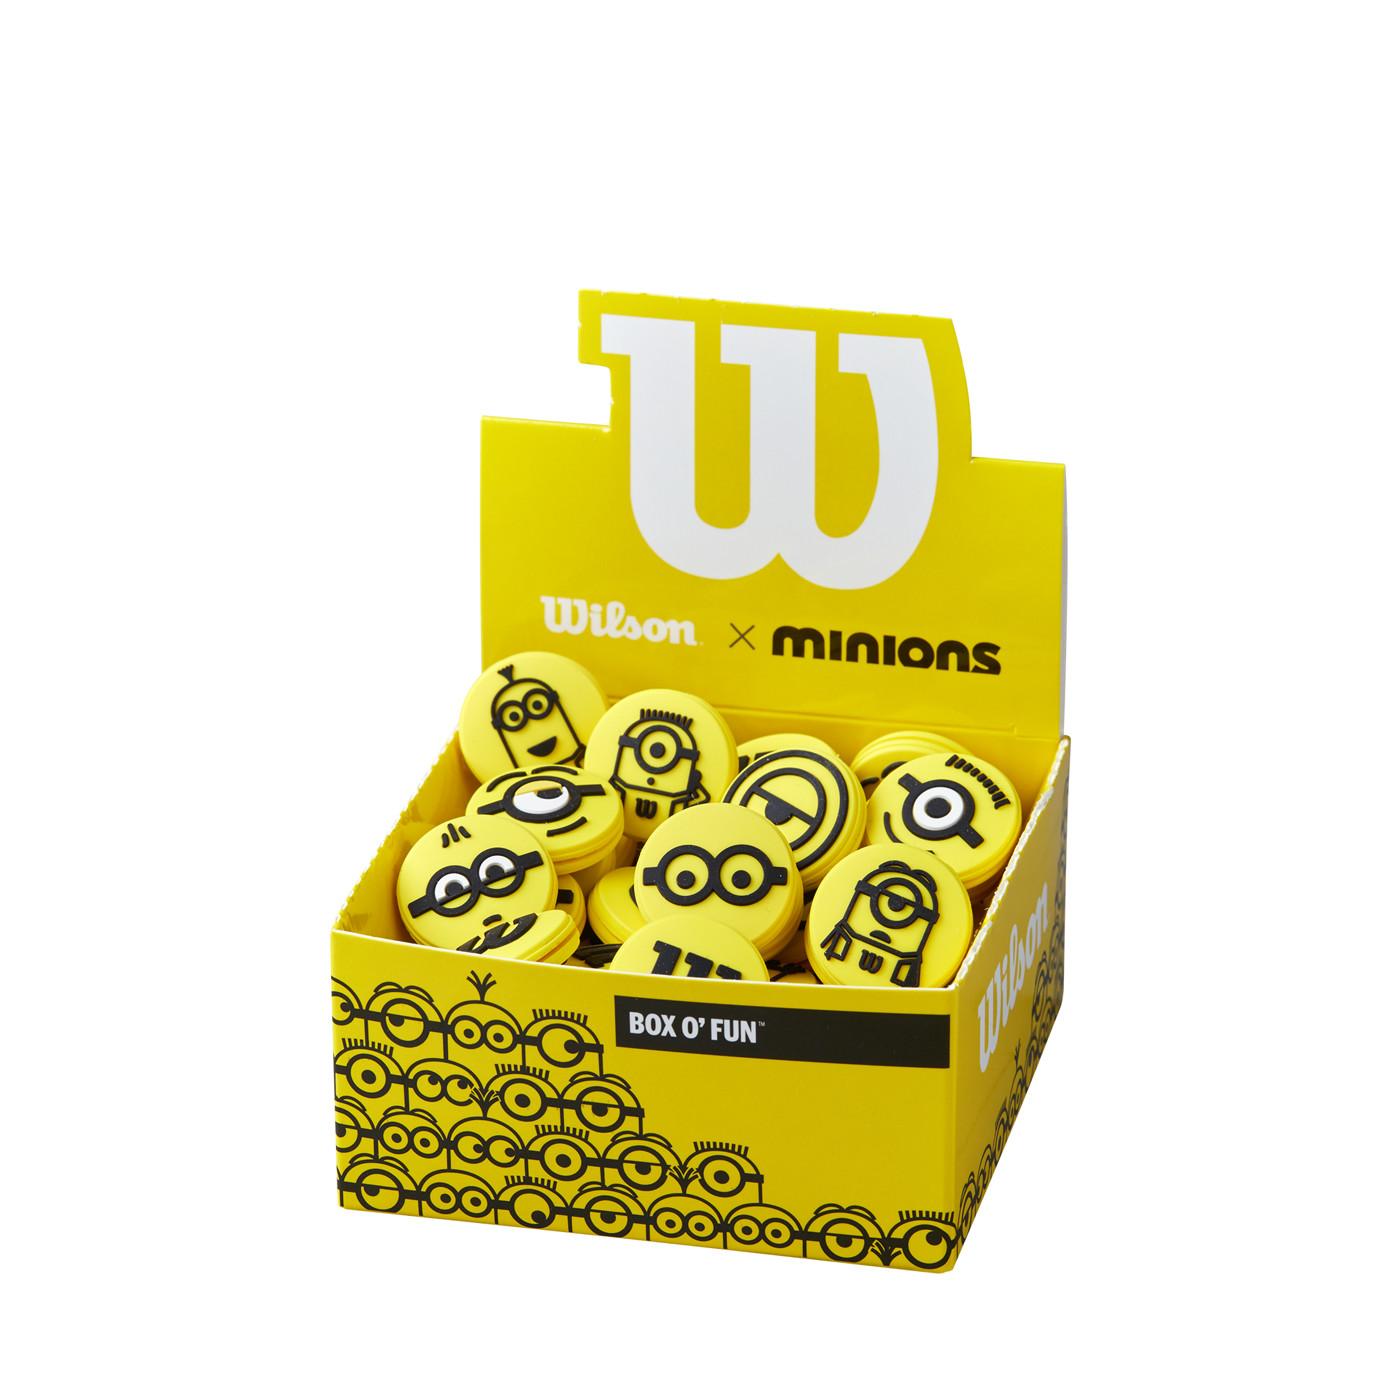 WILSON MINIONS VIBRATION DAMPENER BOX